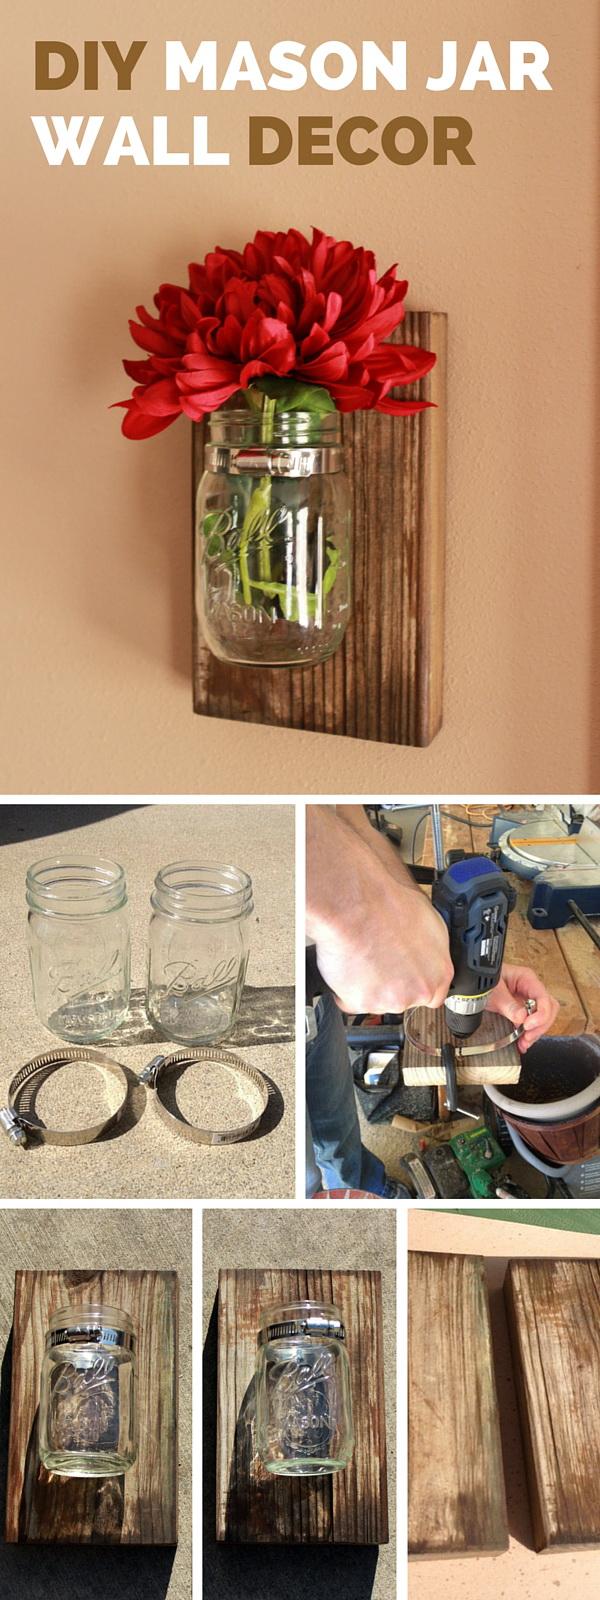 DIY Mason Jar Wall Decorations: Get Creative Decorating Your Walls. Fixing  Mason Jars With